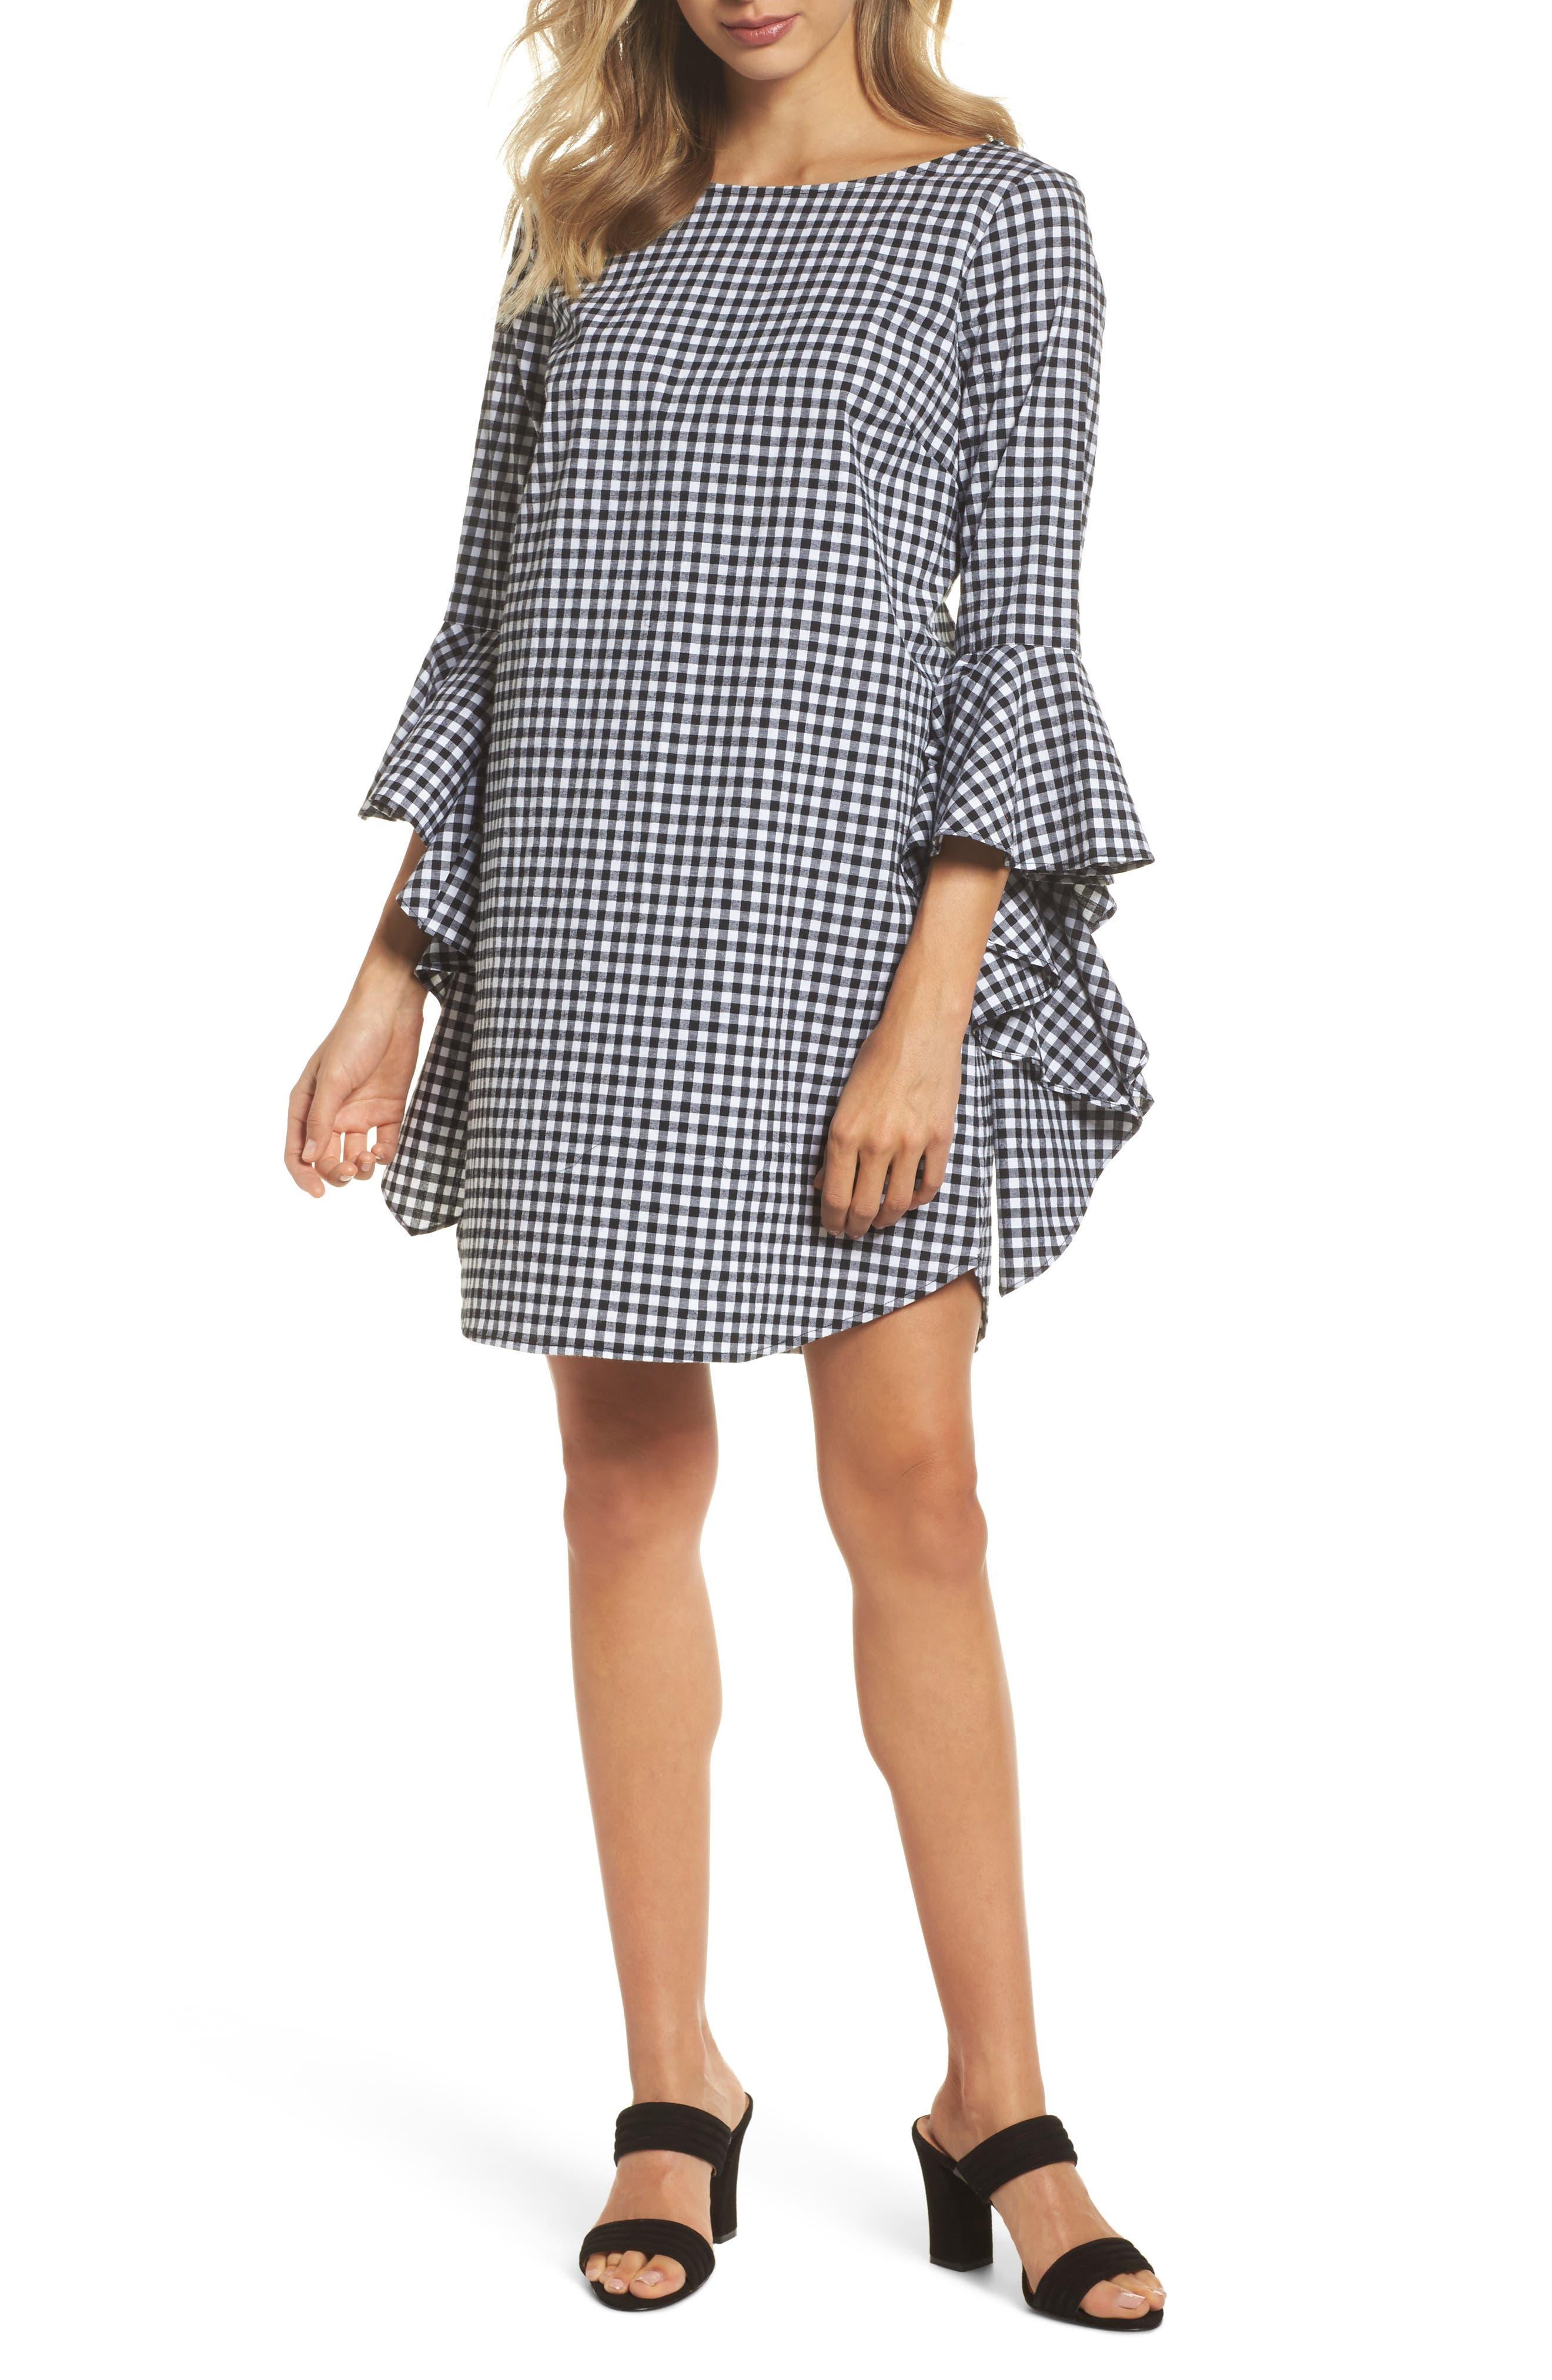 Ruffle Sleeve Gingham Shift Dress,                             Main thumbnail 1, color,                             Black/ White Gingham